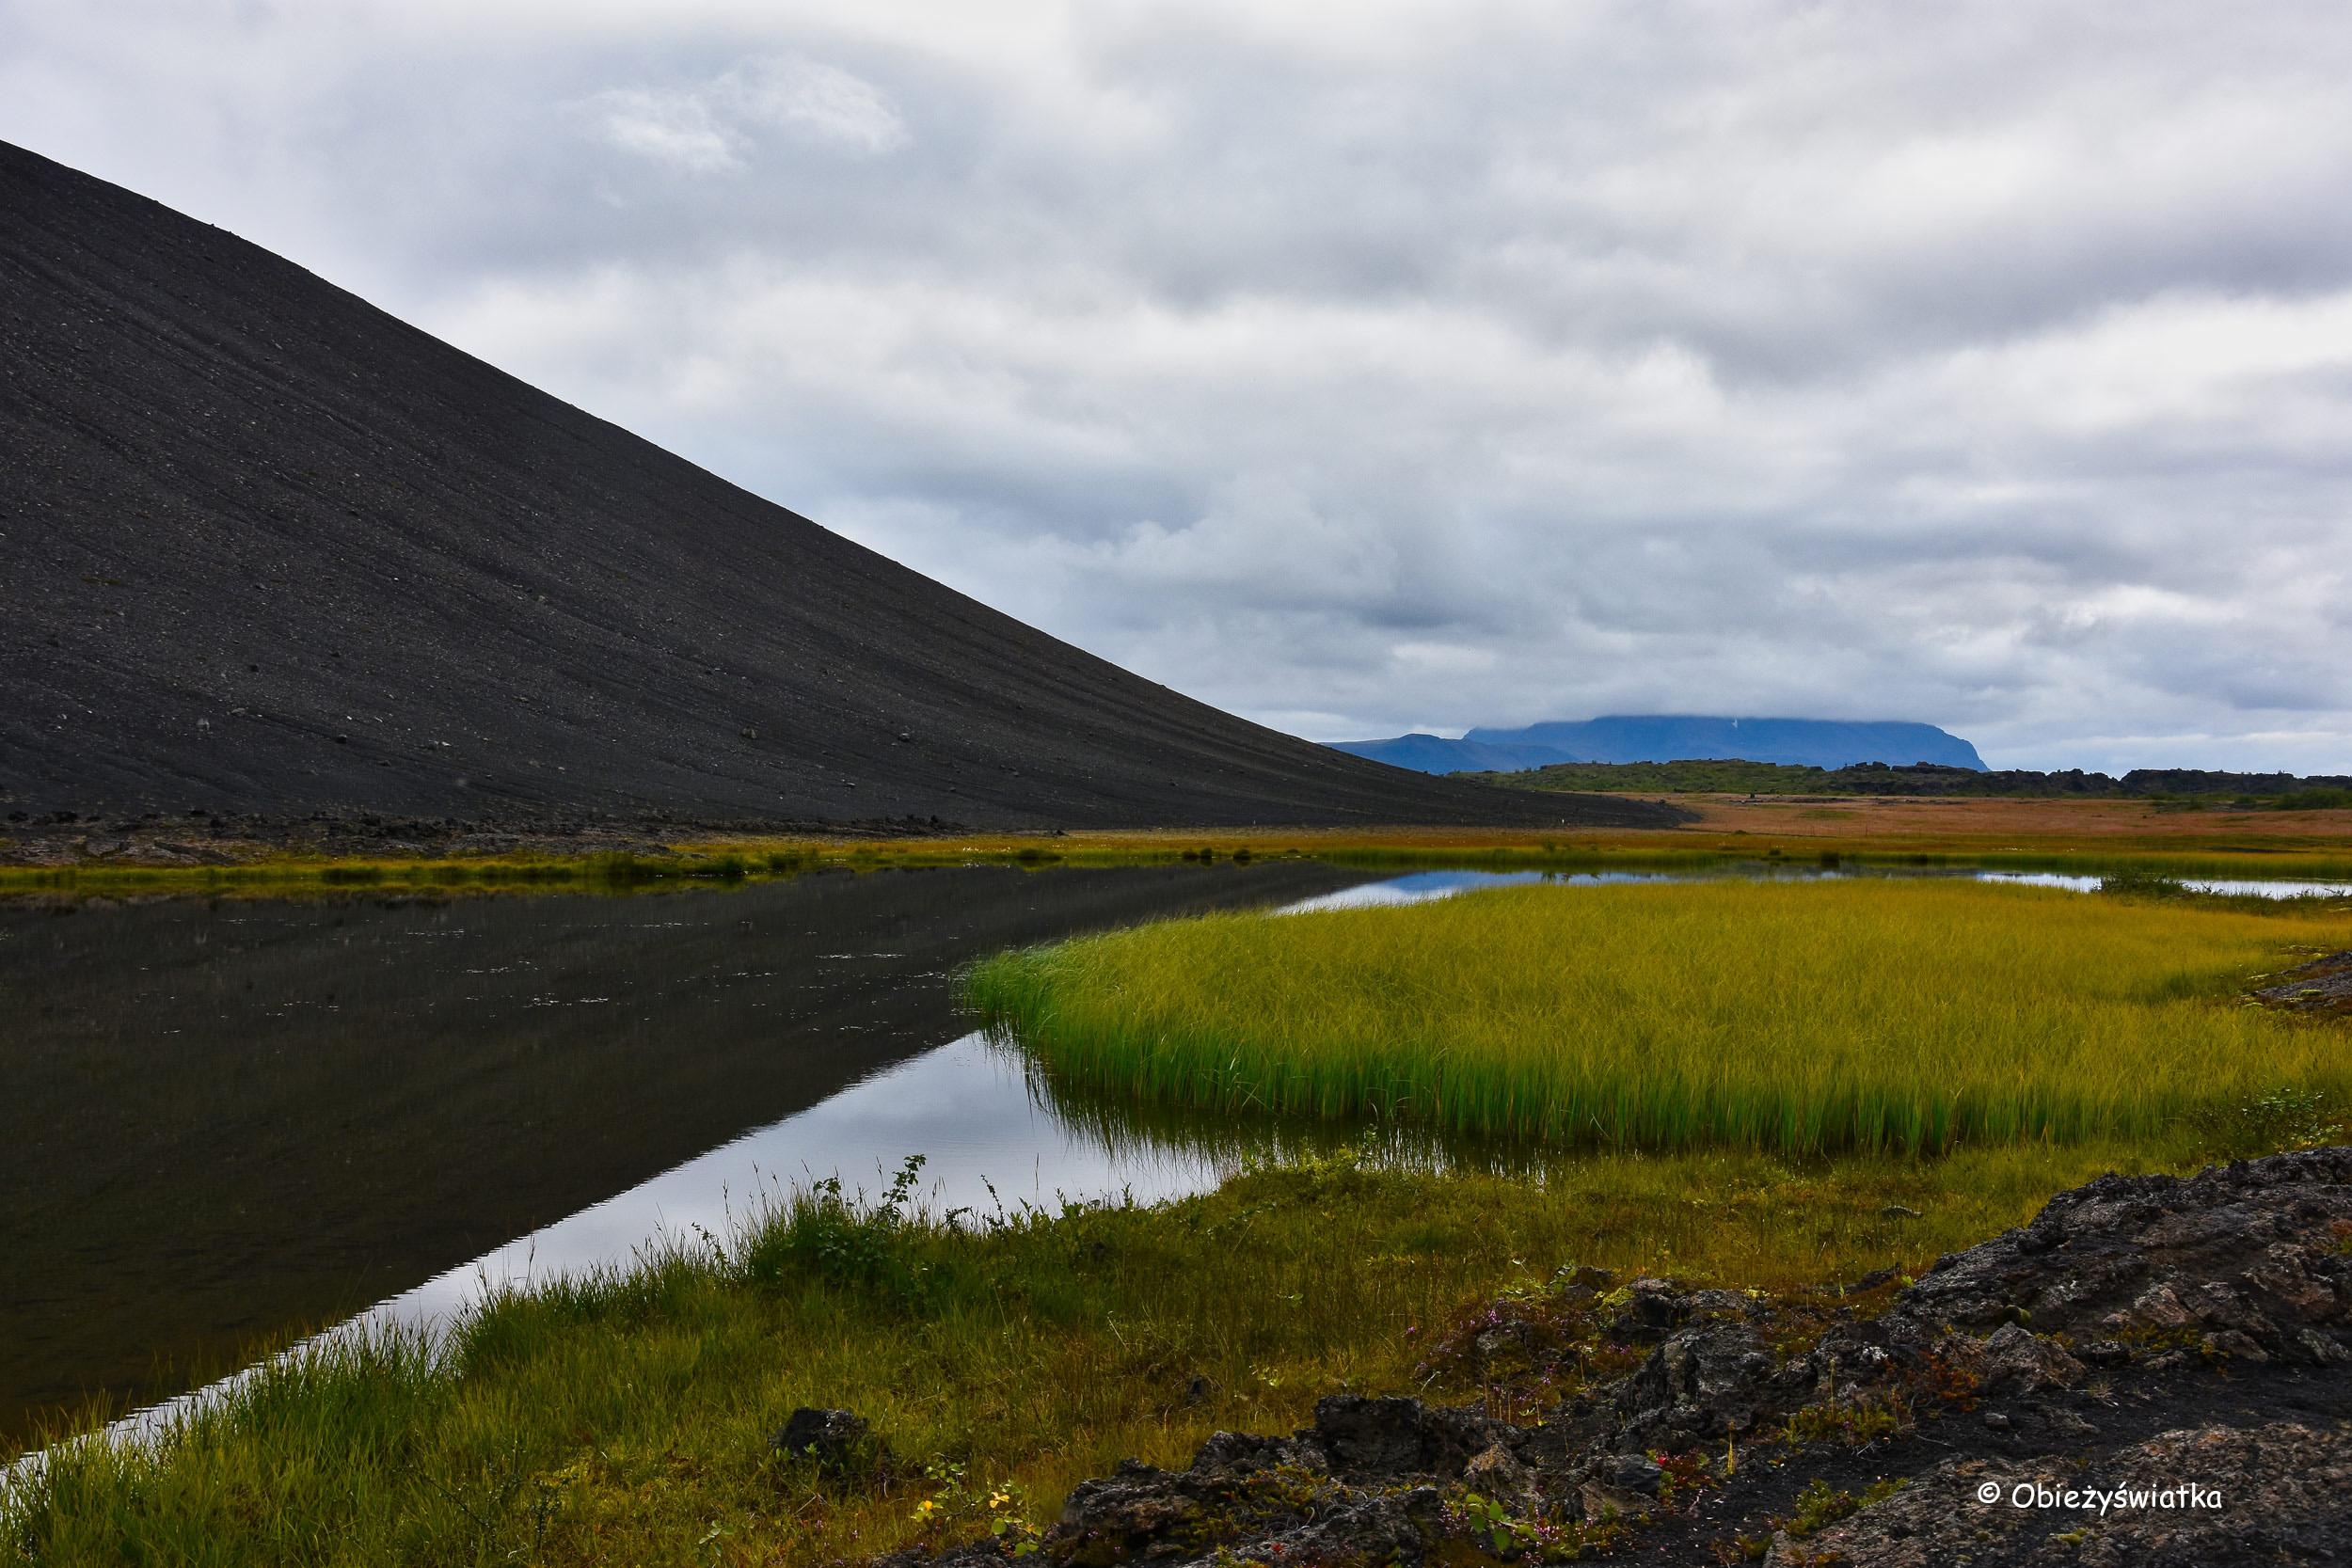 Pod wulkanem Hverfjall, Islandia